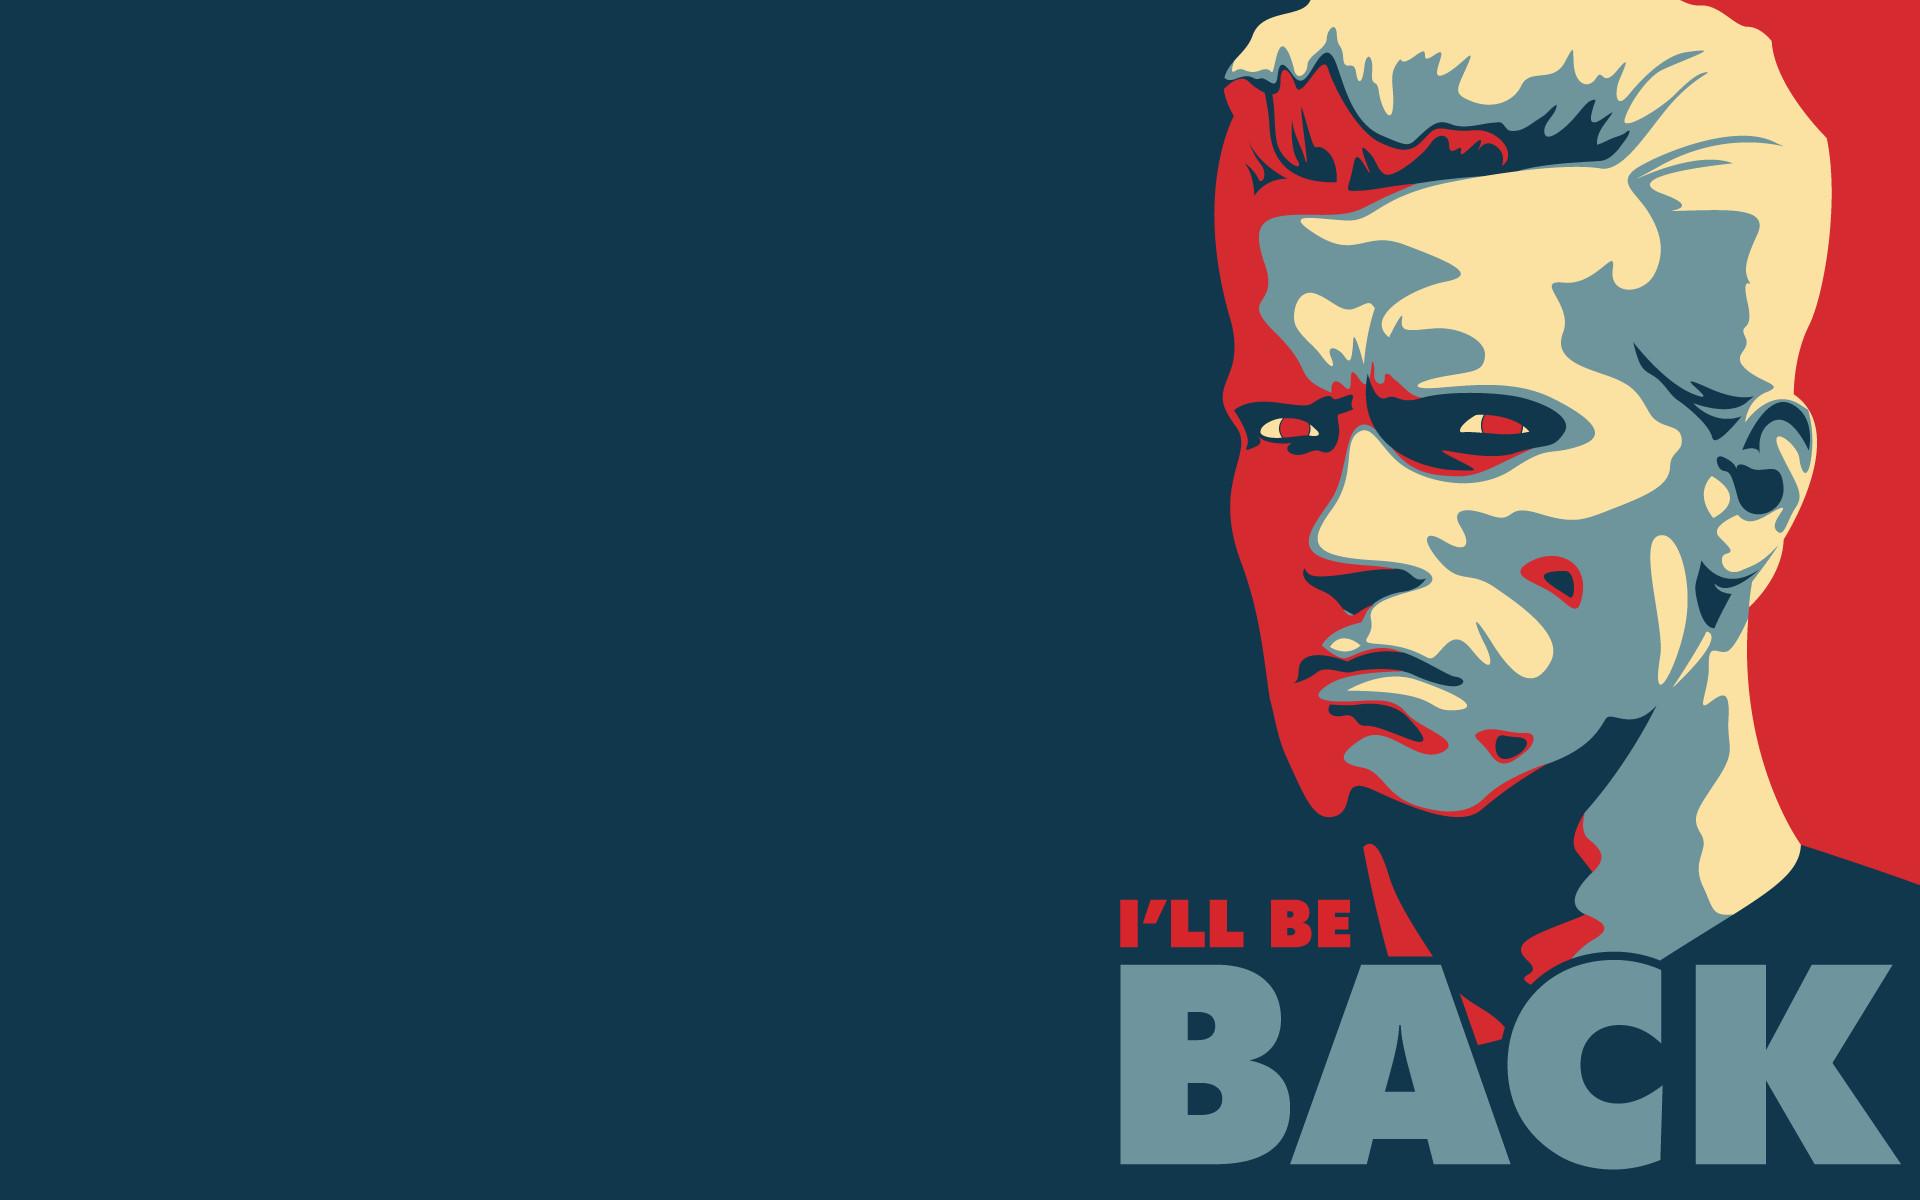 Terminator 2 Judgment Day 1920×1080 Wallpapers, 1920×1080 … | Download  Wallpaper | Pinterest | Wallpaper